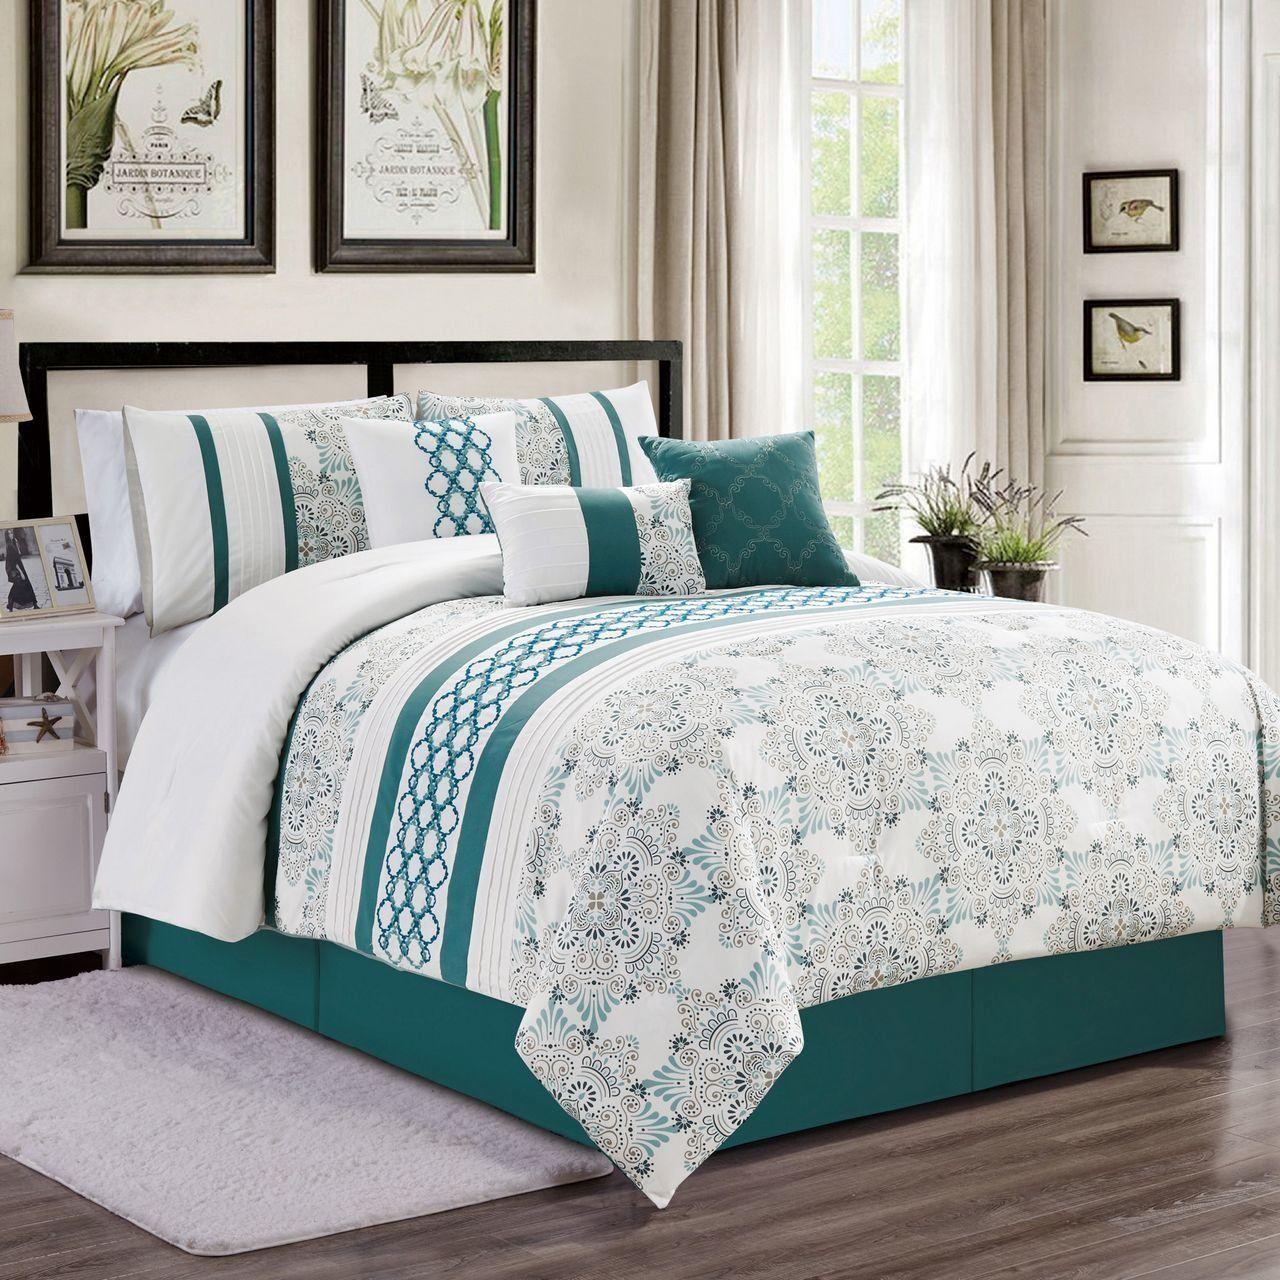 7 Piece Kulbert Teal/White Comforter Set in 2020